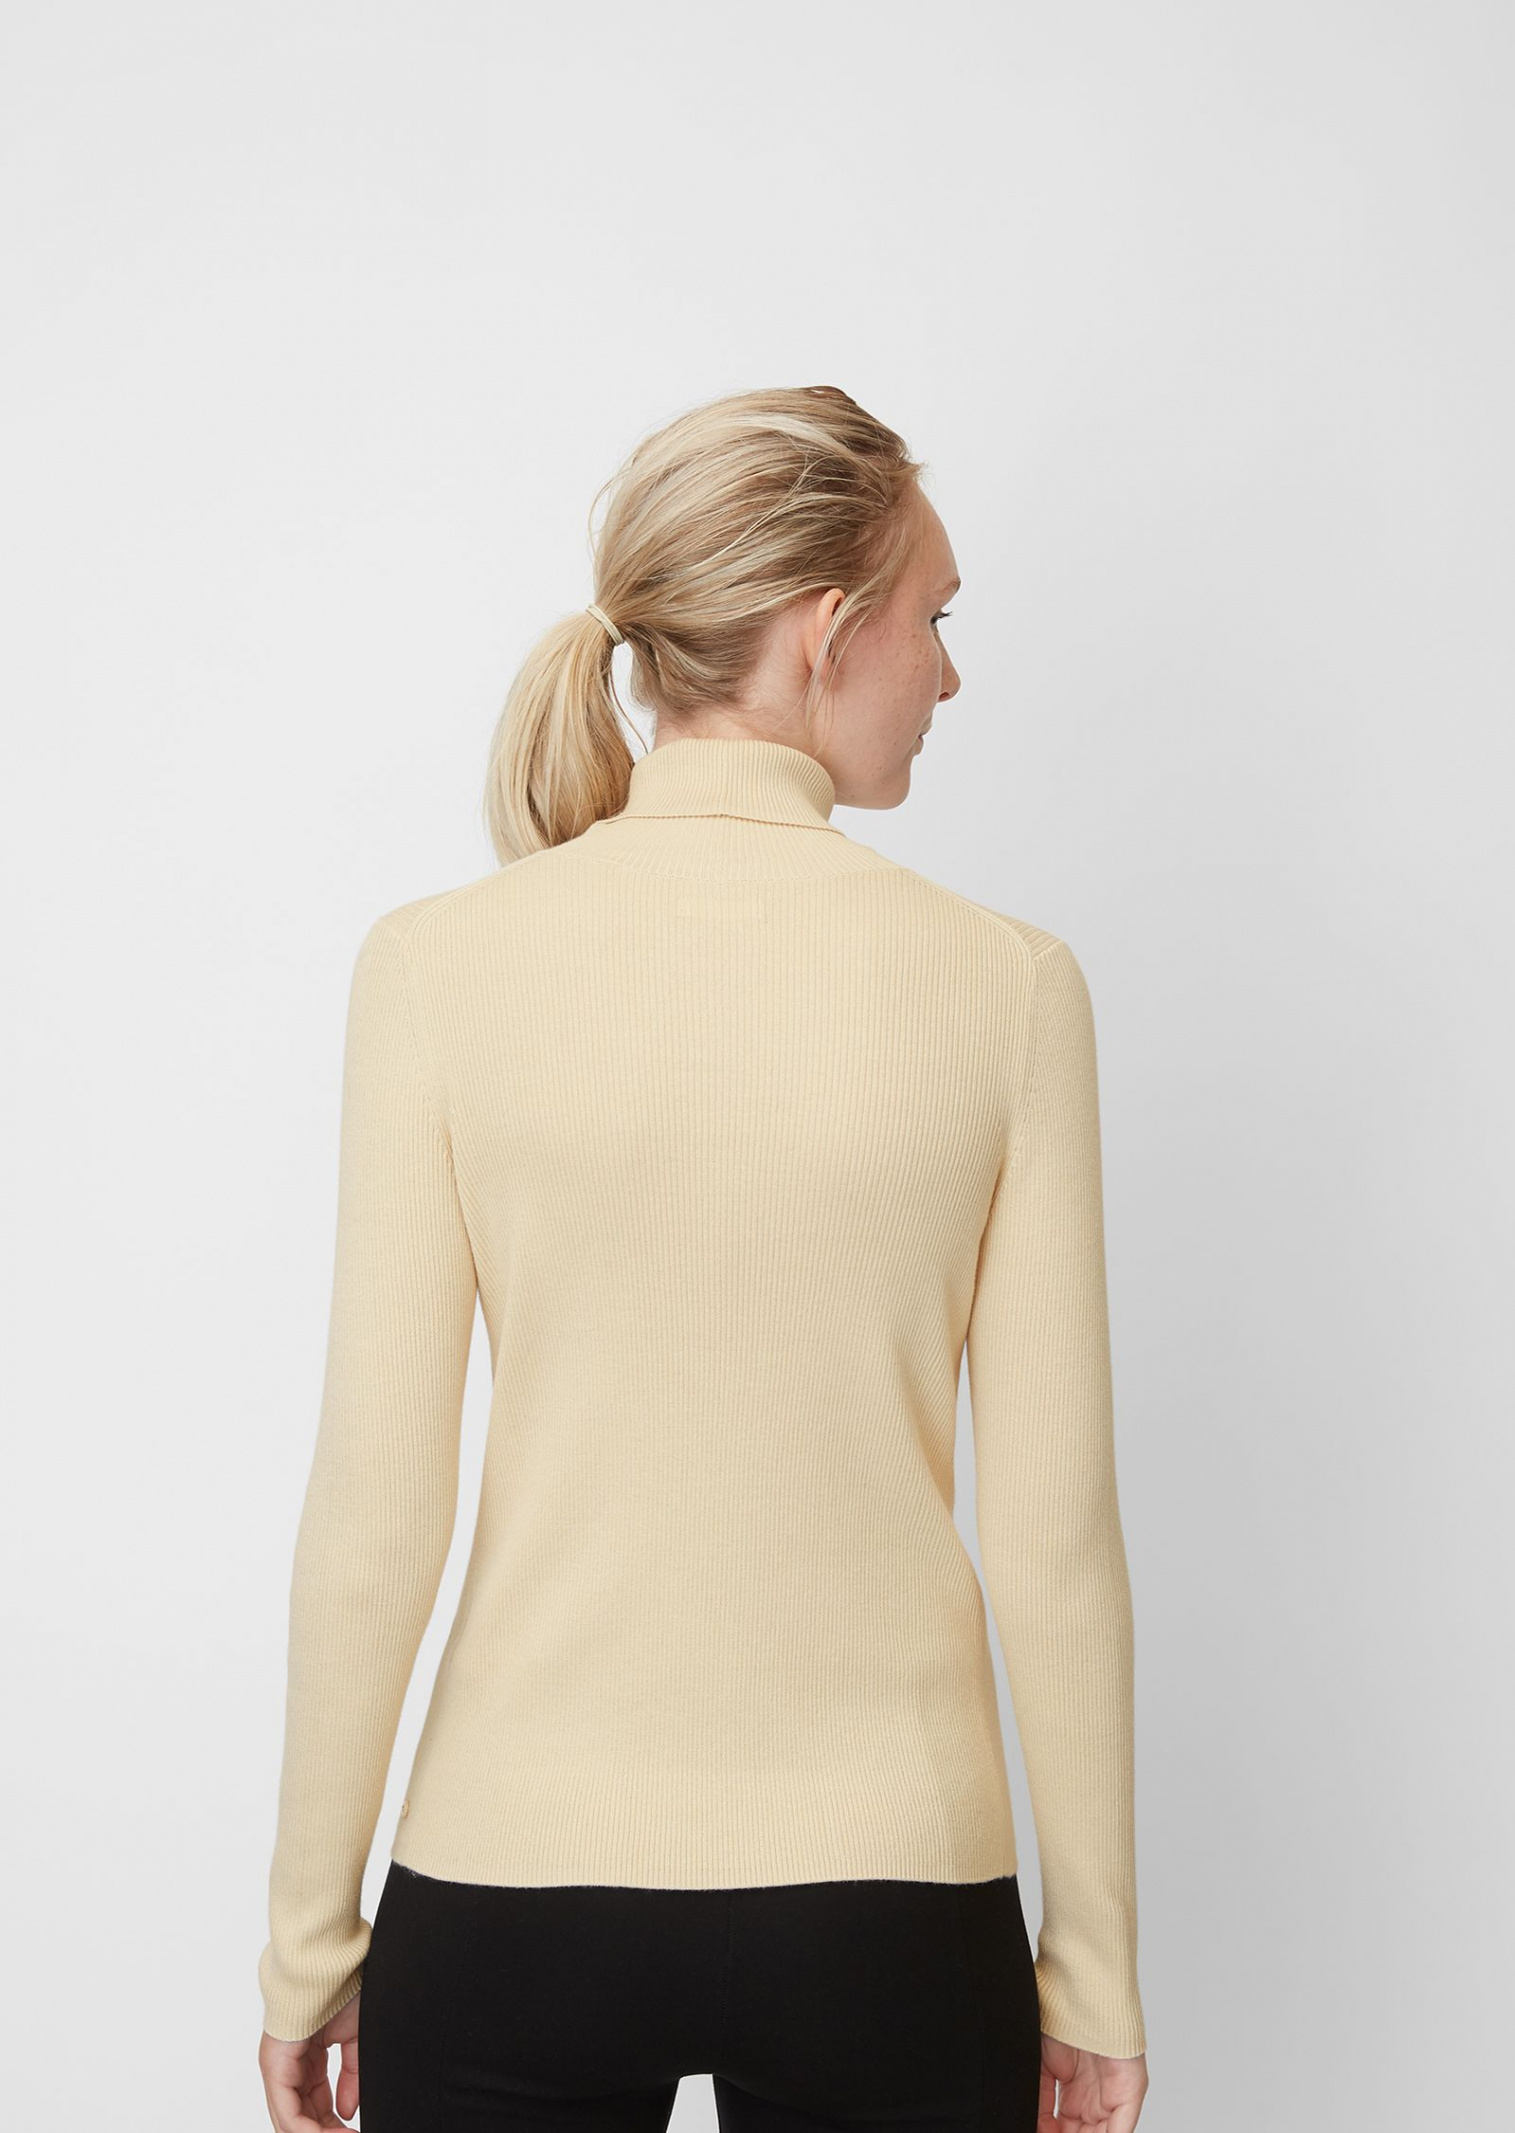 Кофты и свитера женские MARC O'POLO модель PF3858 , 2017